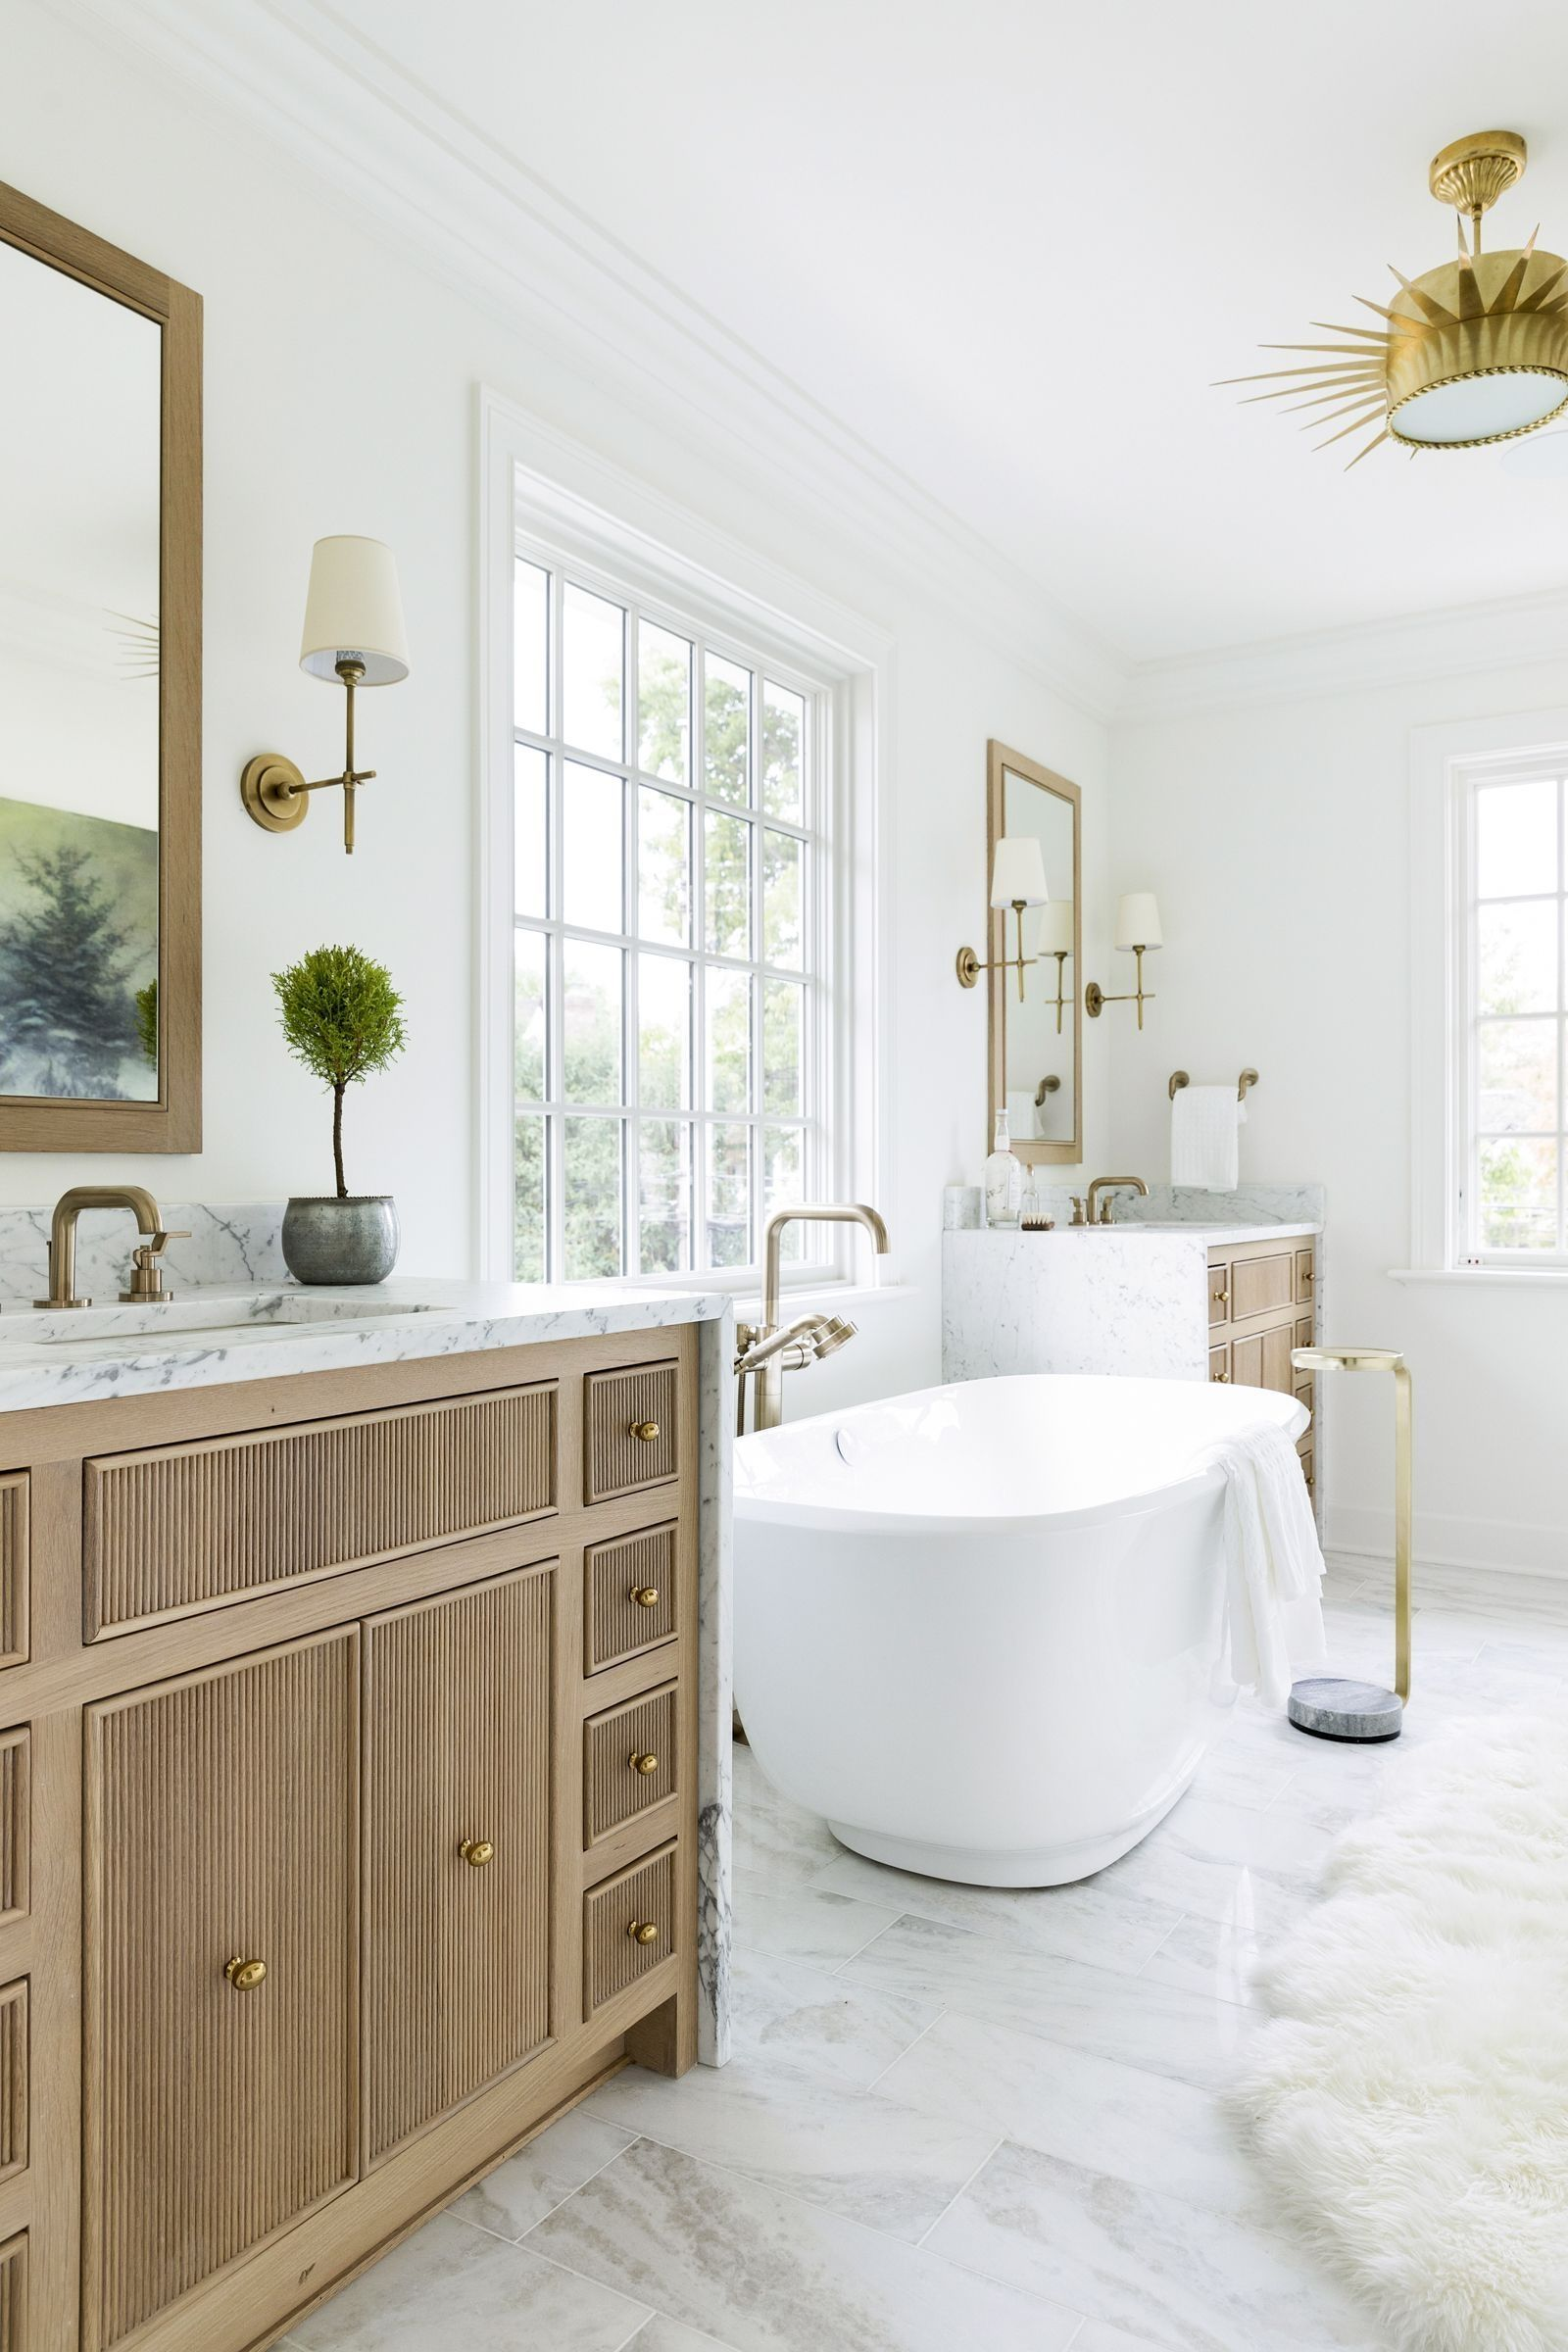 38 Beautiful Ideas Small Bathroom Design that Feels ...